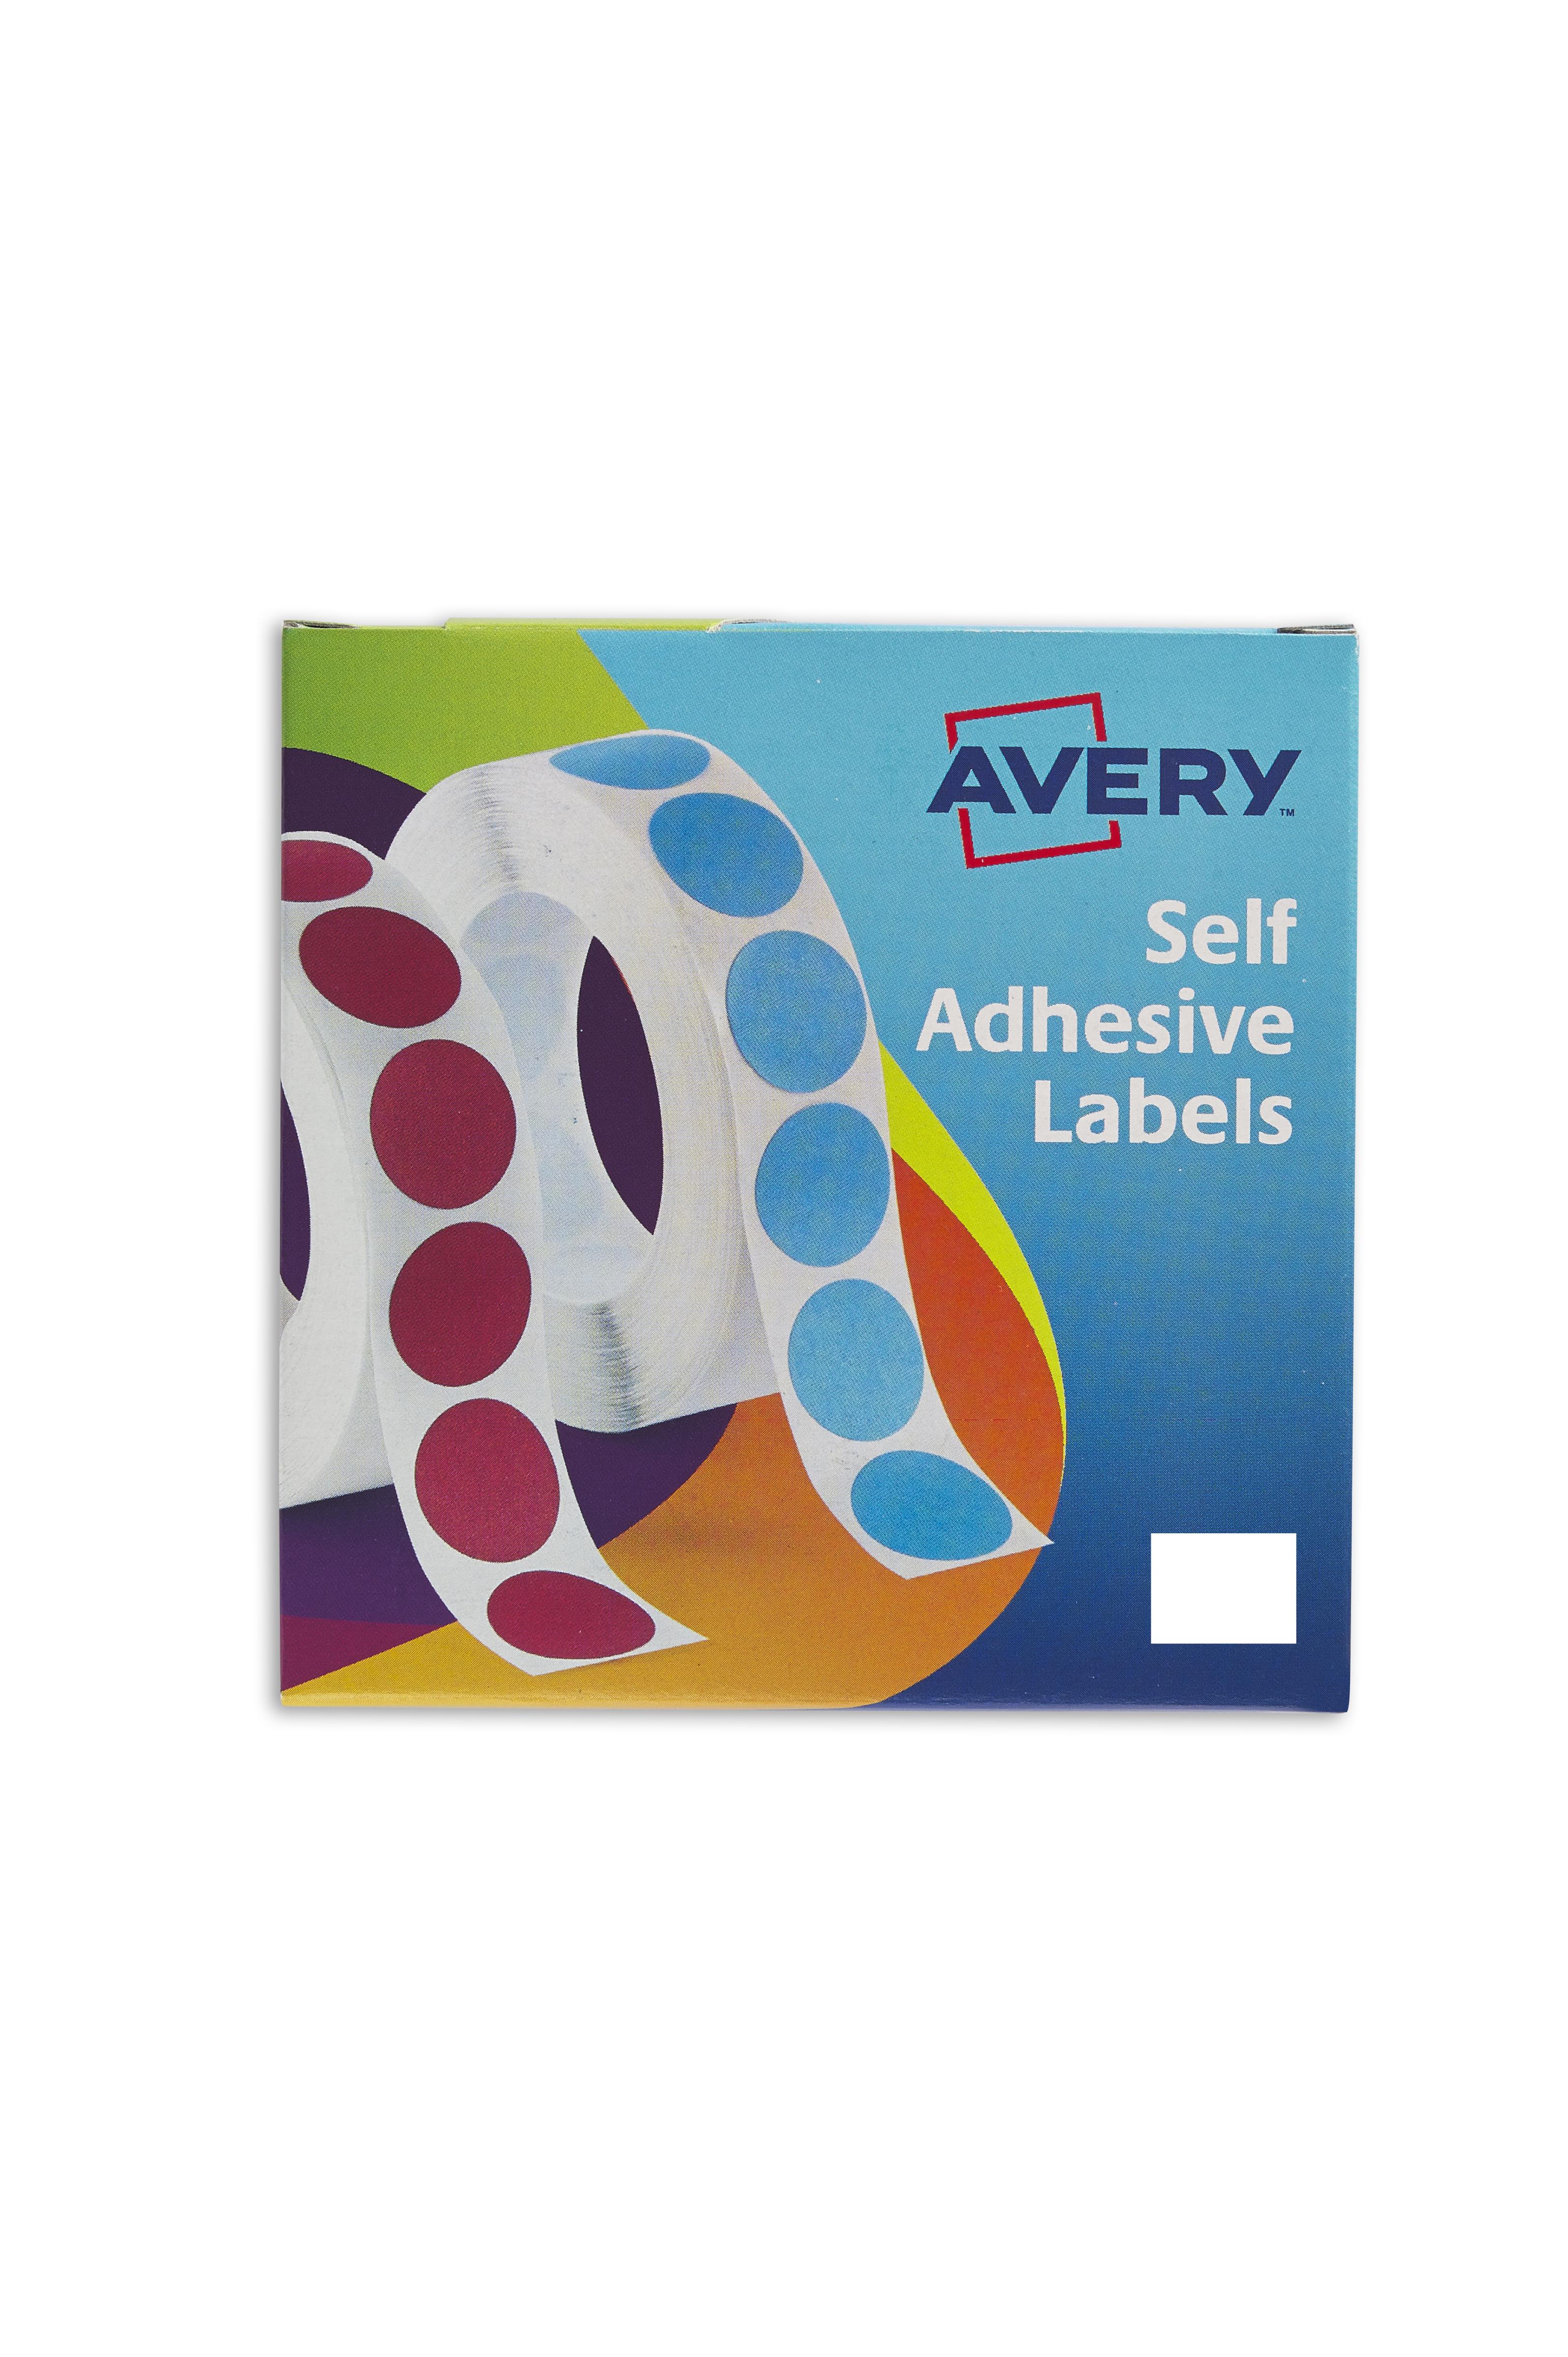 Avery Labels in Dispenser Rectangular 19x25mm White (Pack 1200 Labels) 24-421